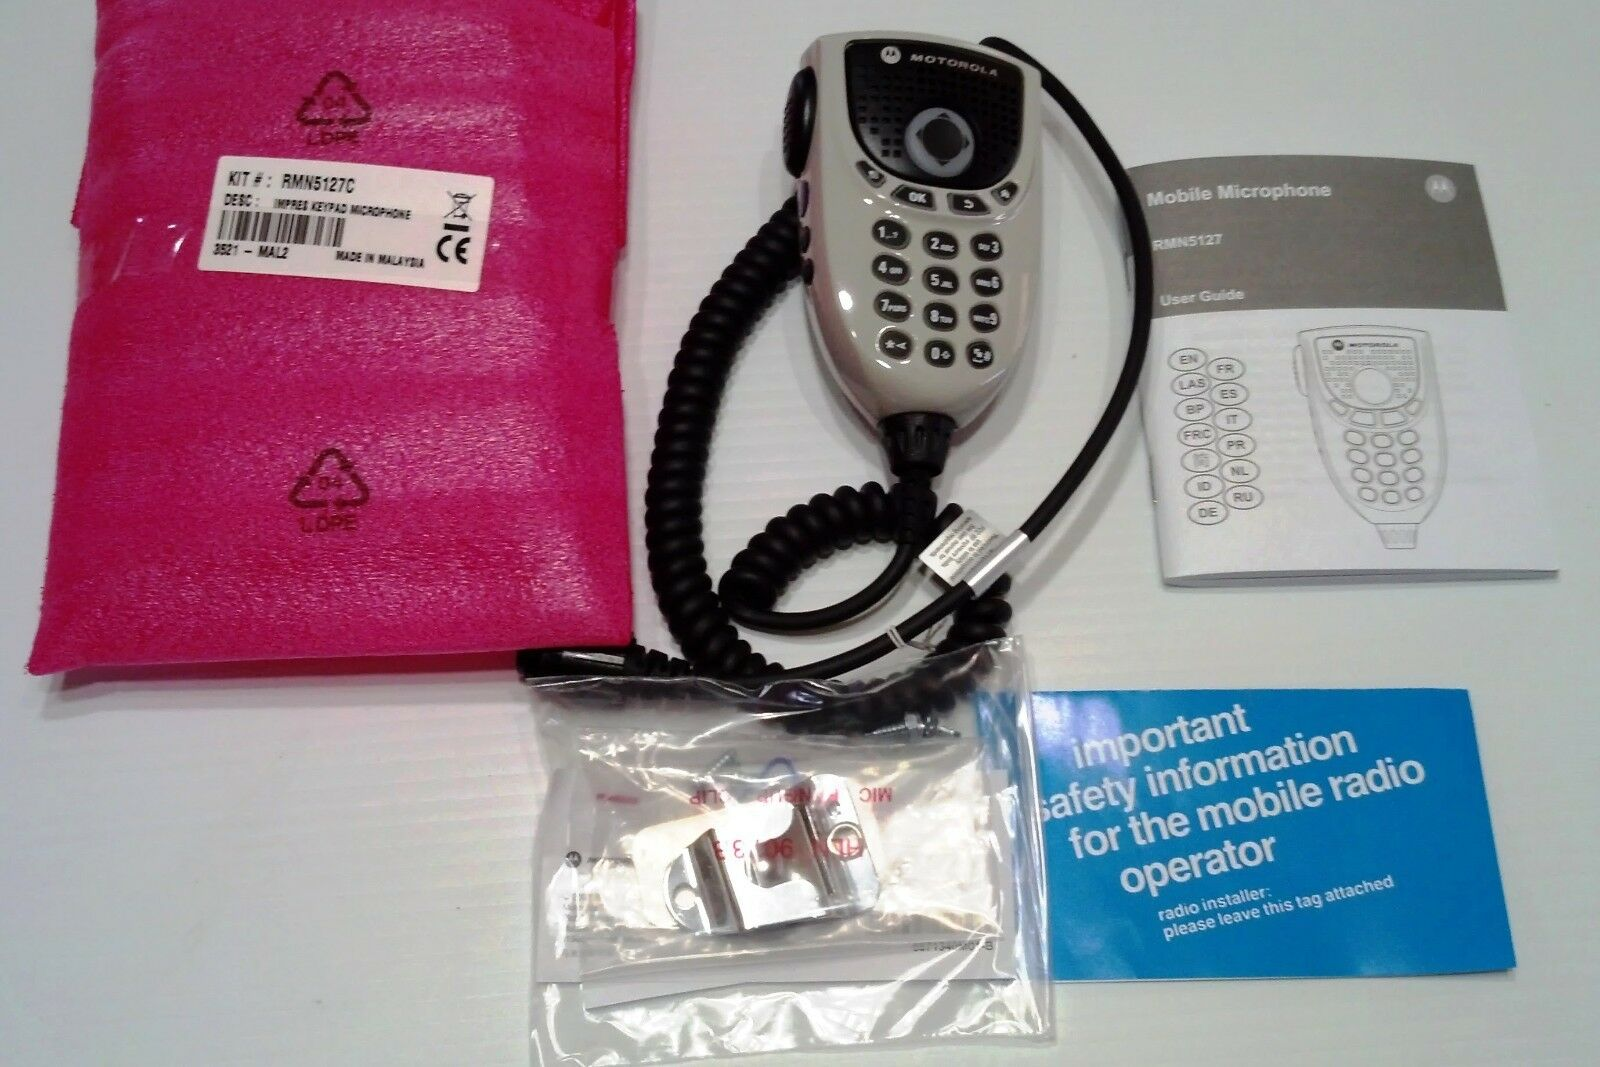 Motorola MotoTRBO IMPRES Audio 4-Way Navigation DTMF Keypad Microphone RMN5127. Buy it now for 124.95